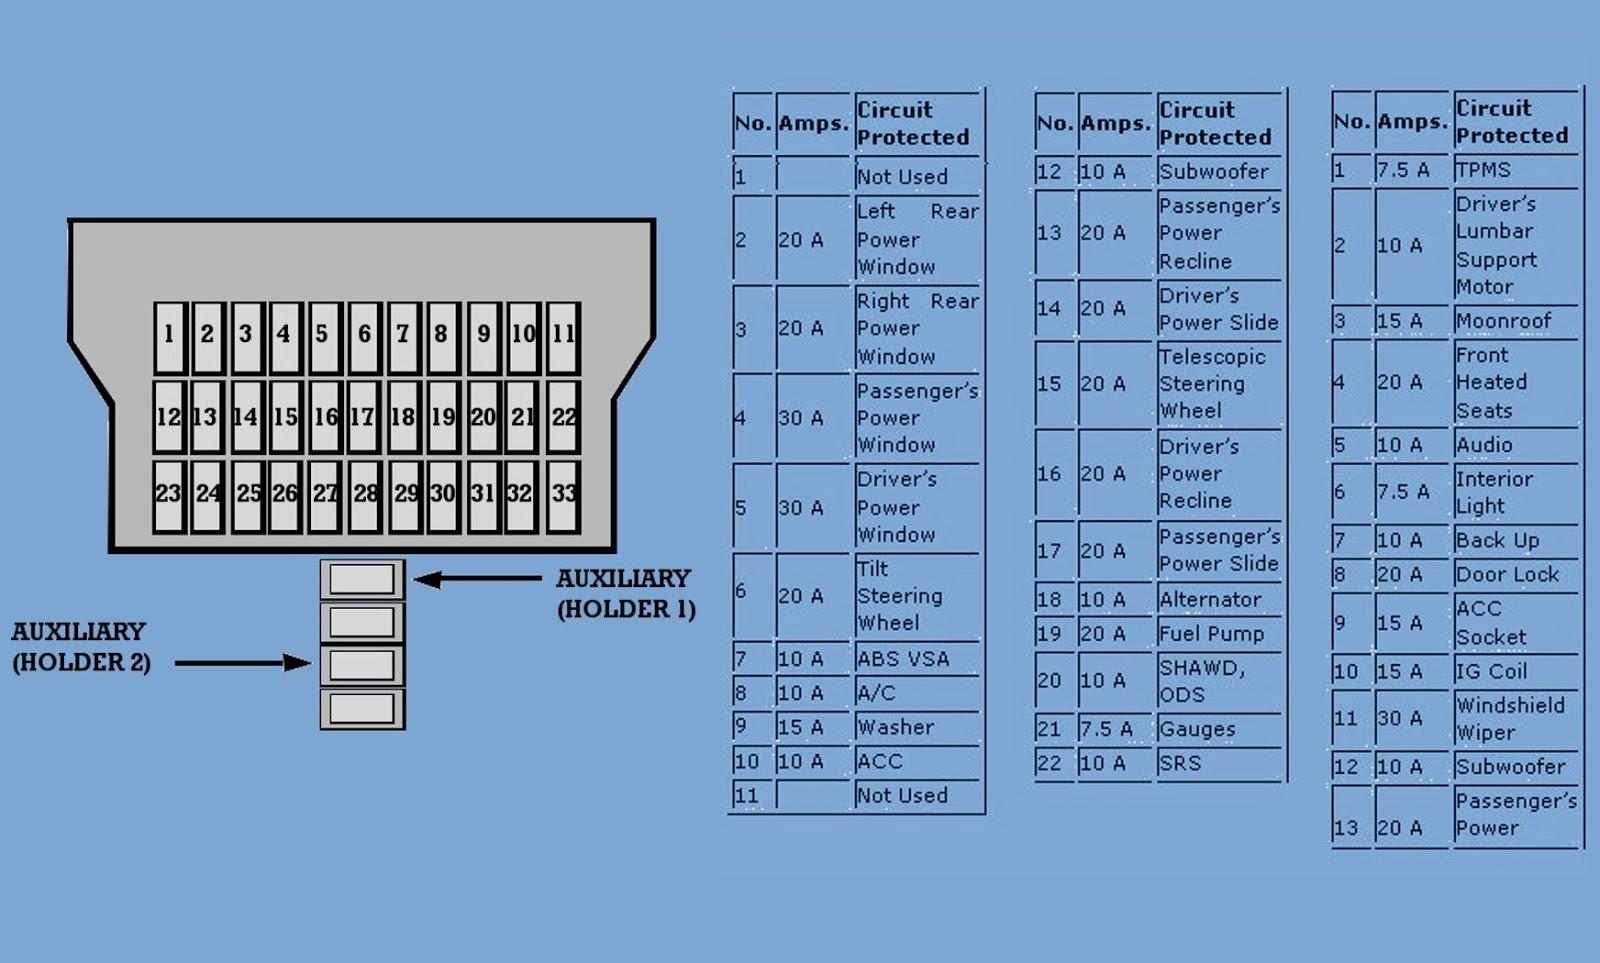 2010 Acura MDX Fuse Box Map and Diagram | Fuse Box Diagram